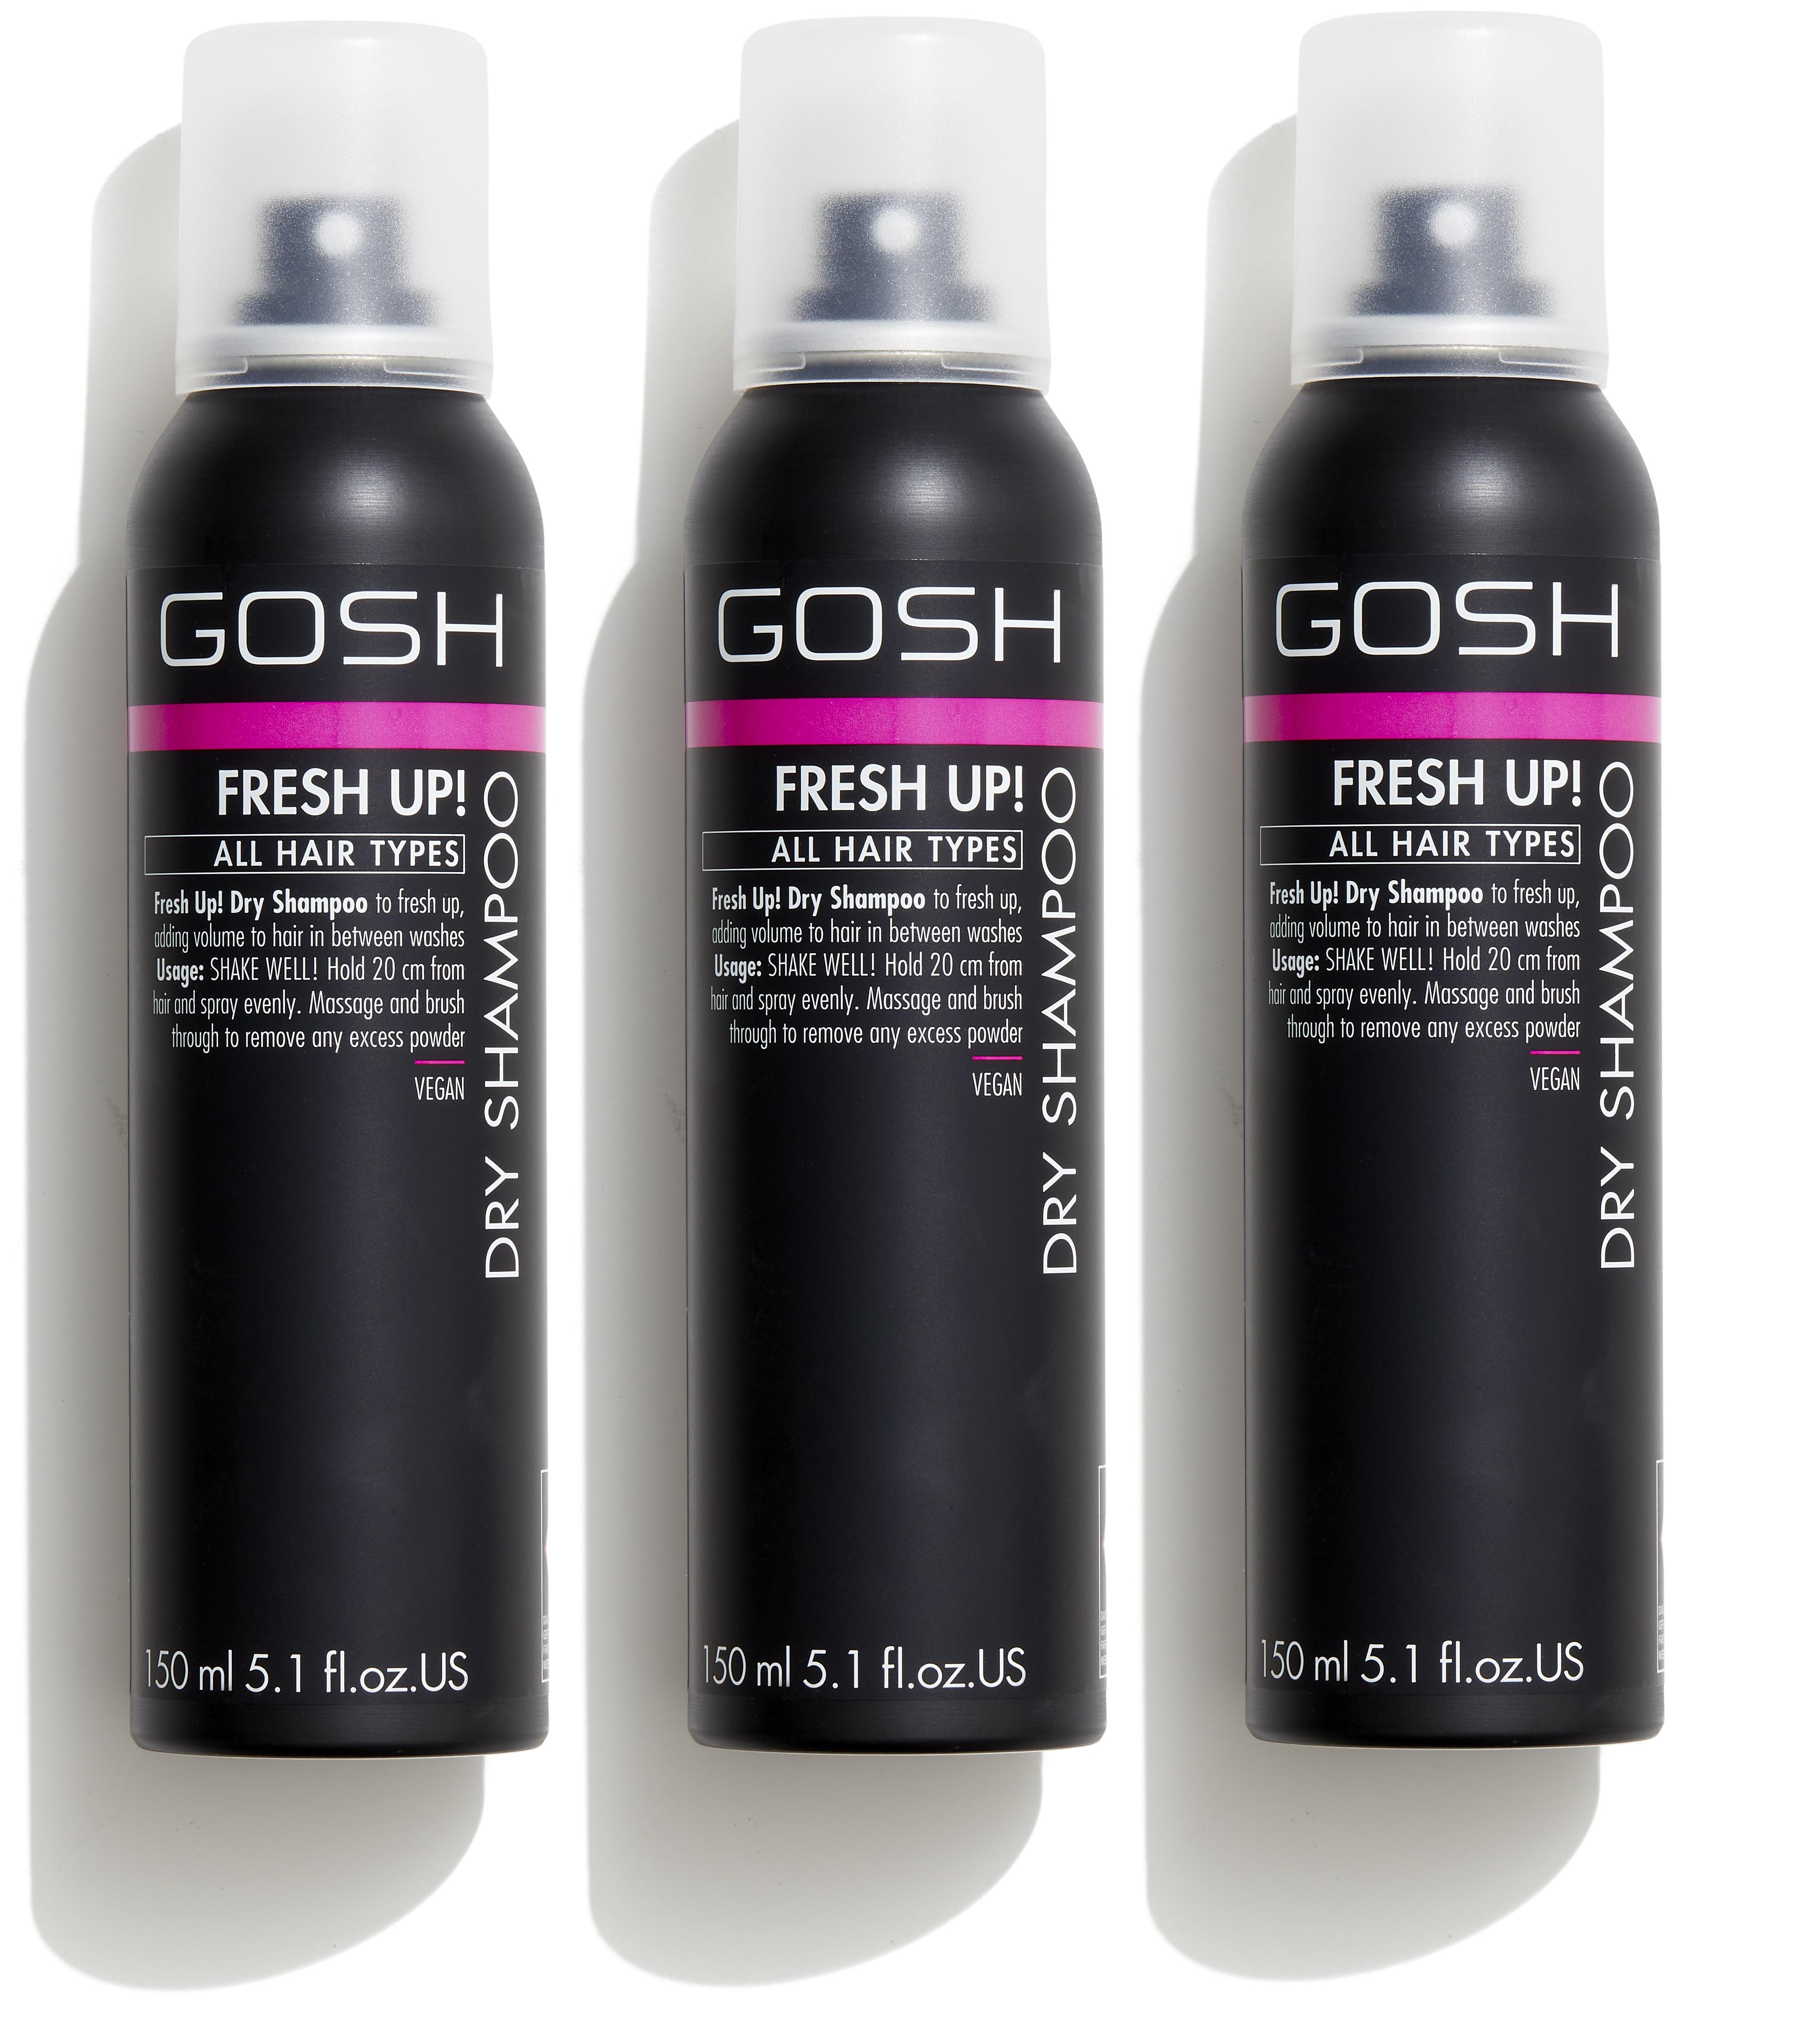 GOSH - 3 x Fresh Up Dry Shampoo 150 ml